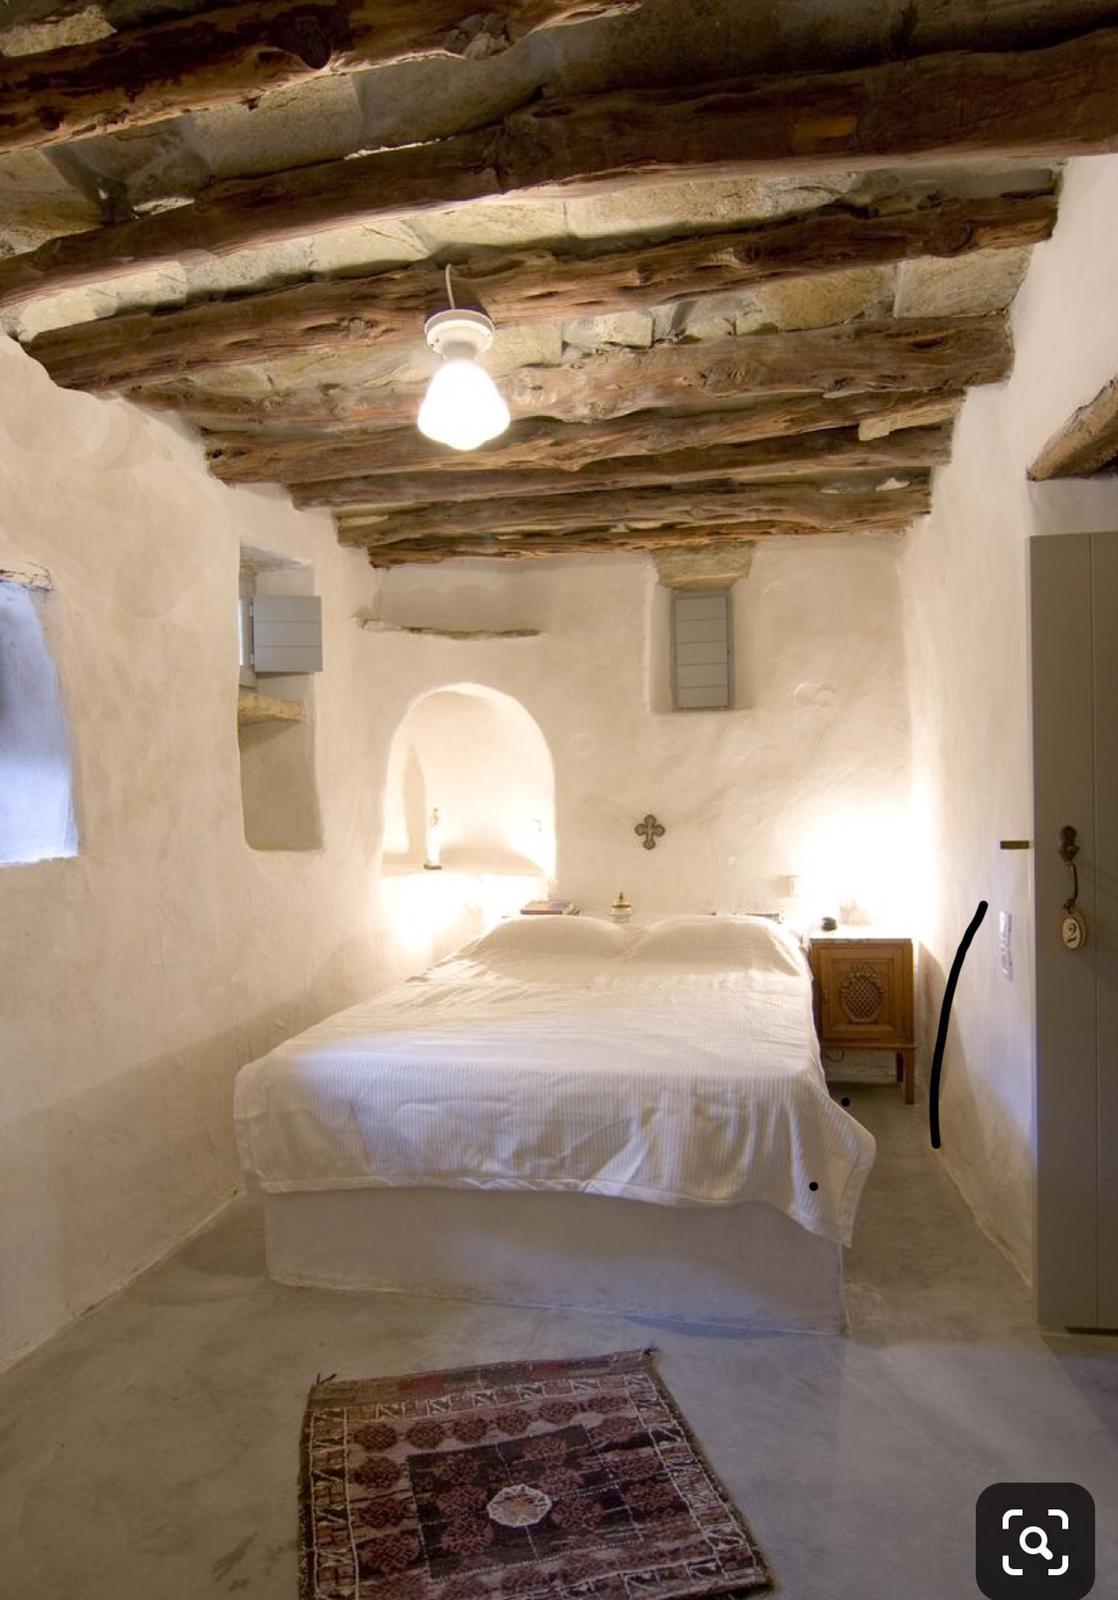 For Sale - Semi-Detached House - Casares - 10 - homeandhelp.com